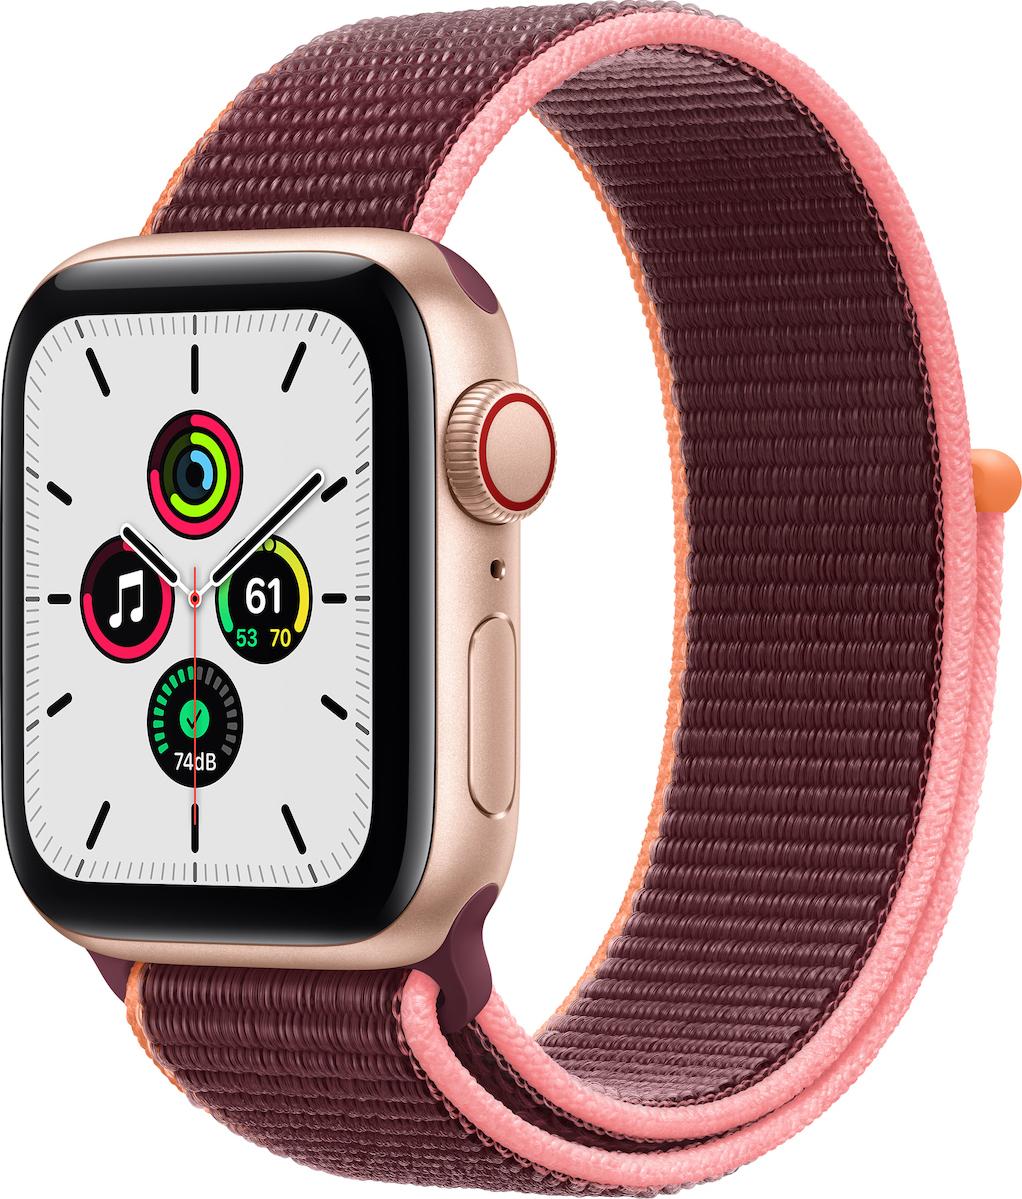 Apple Watch SE Aluminium Cellular 40mm (Gold & Plum Sport Loop) (MYEJ2WB/A) - Πληρωμή και σε έως 36 Δόσεις!!!